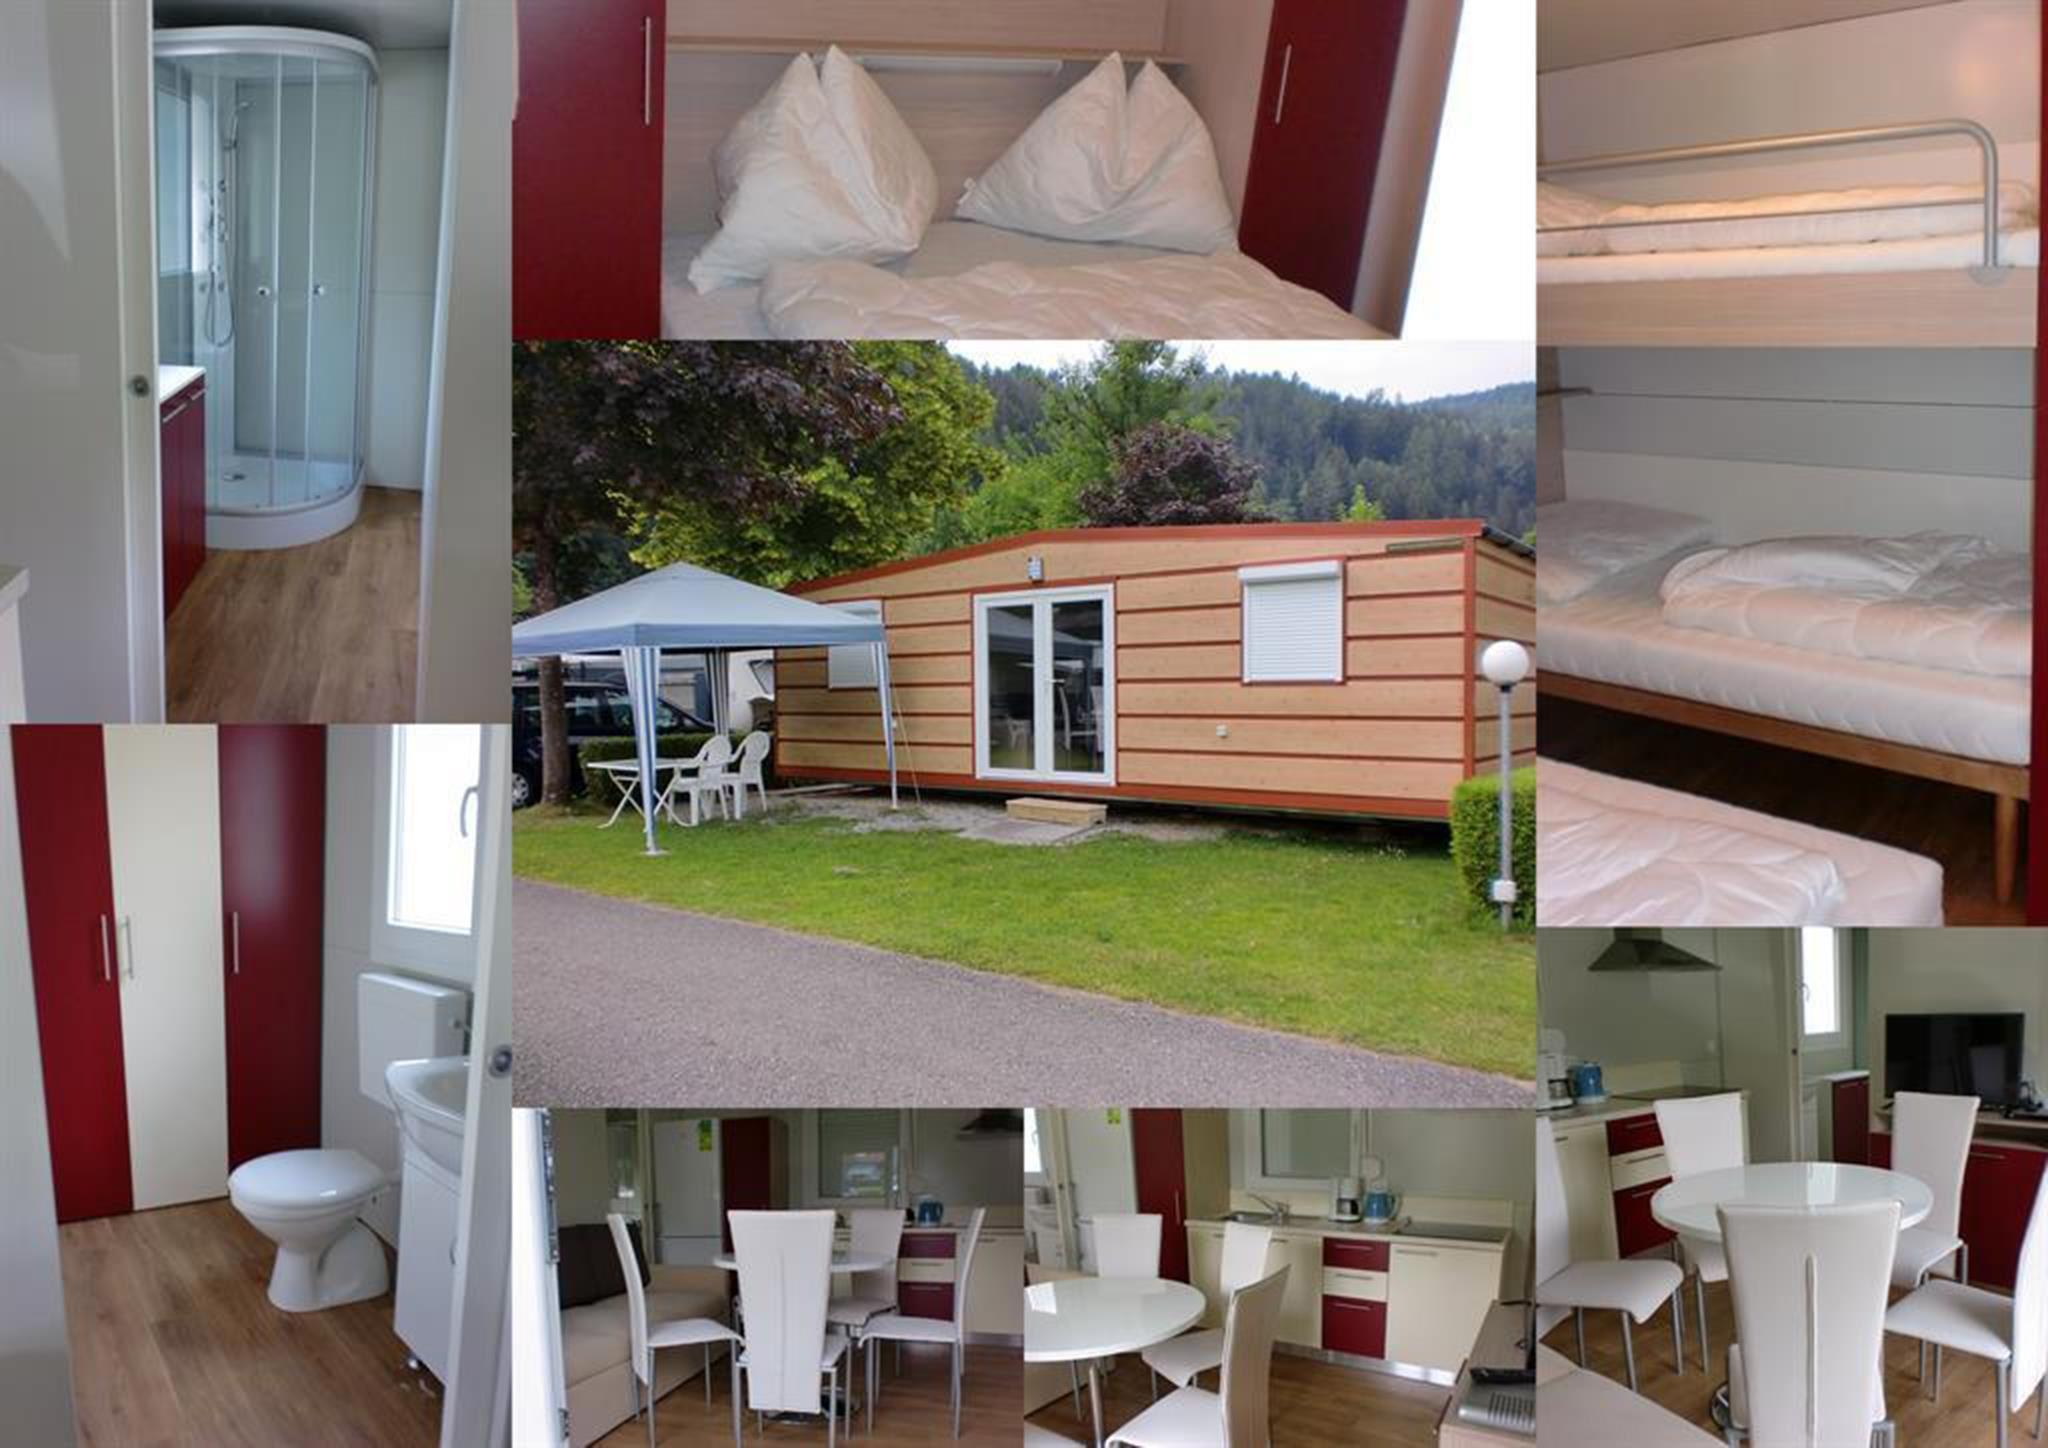 schwimmbad camping m ssler d briach. Black Bedroom Furniture Sets. Home Design Ideas